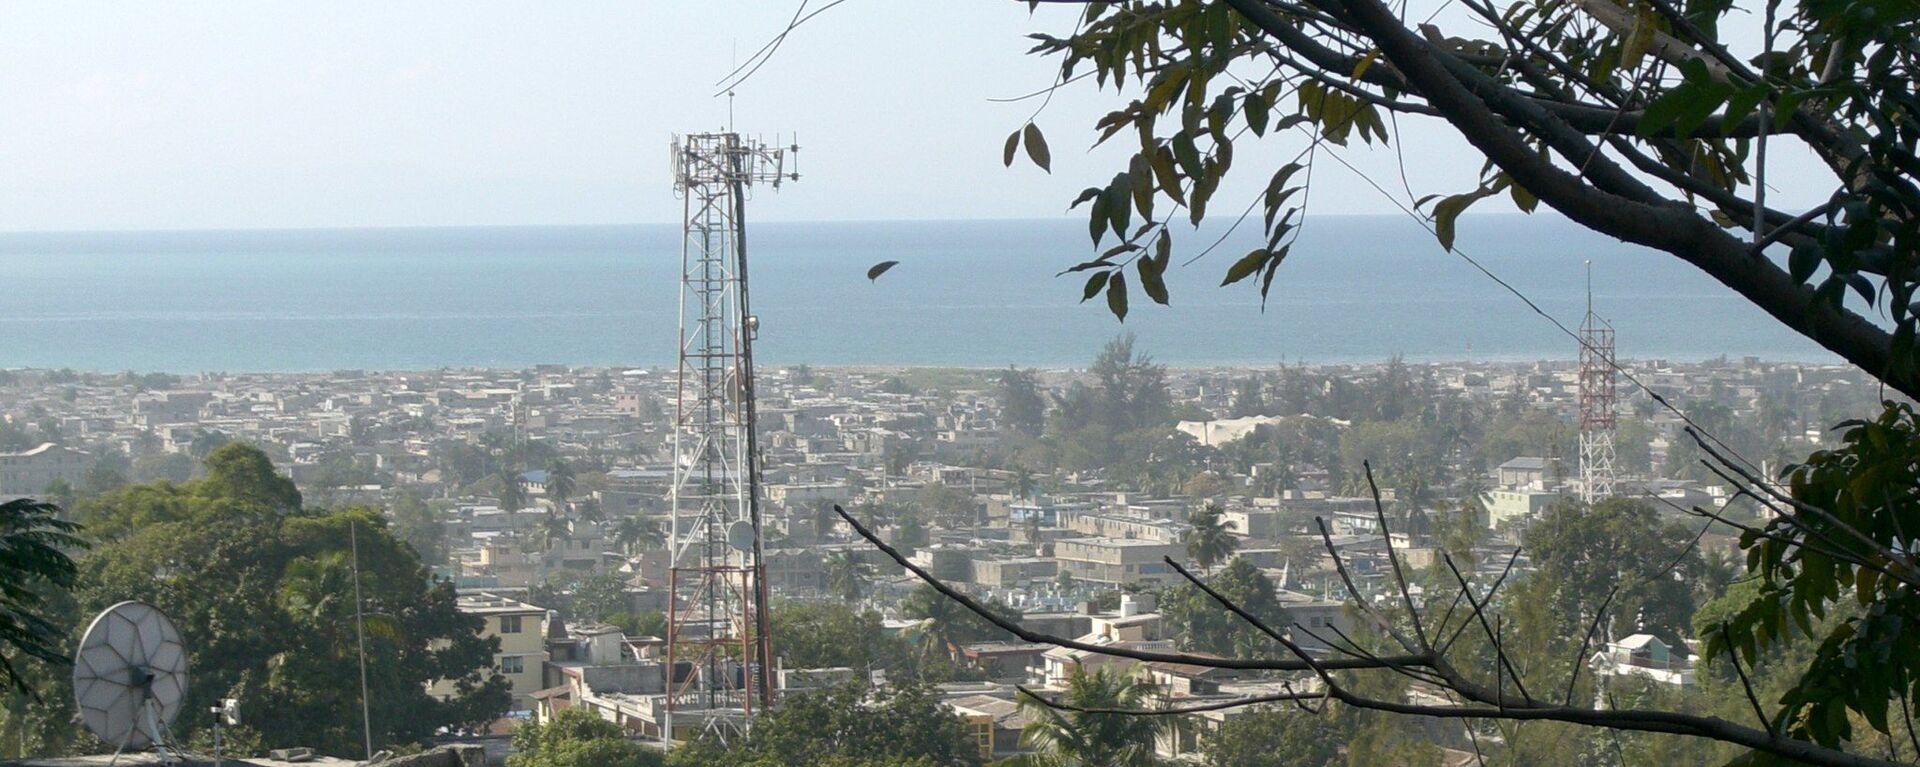 Port-au-Prince - Sputnik France, 1920, 07.07.2021